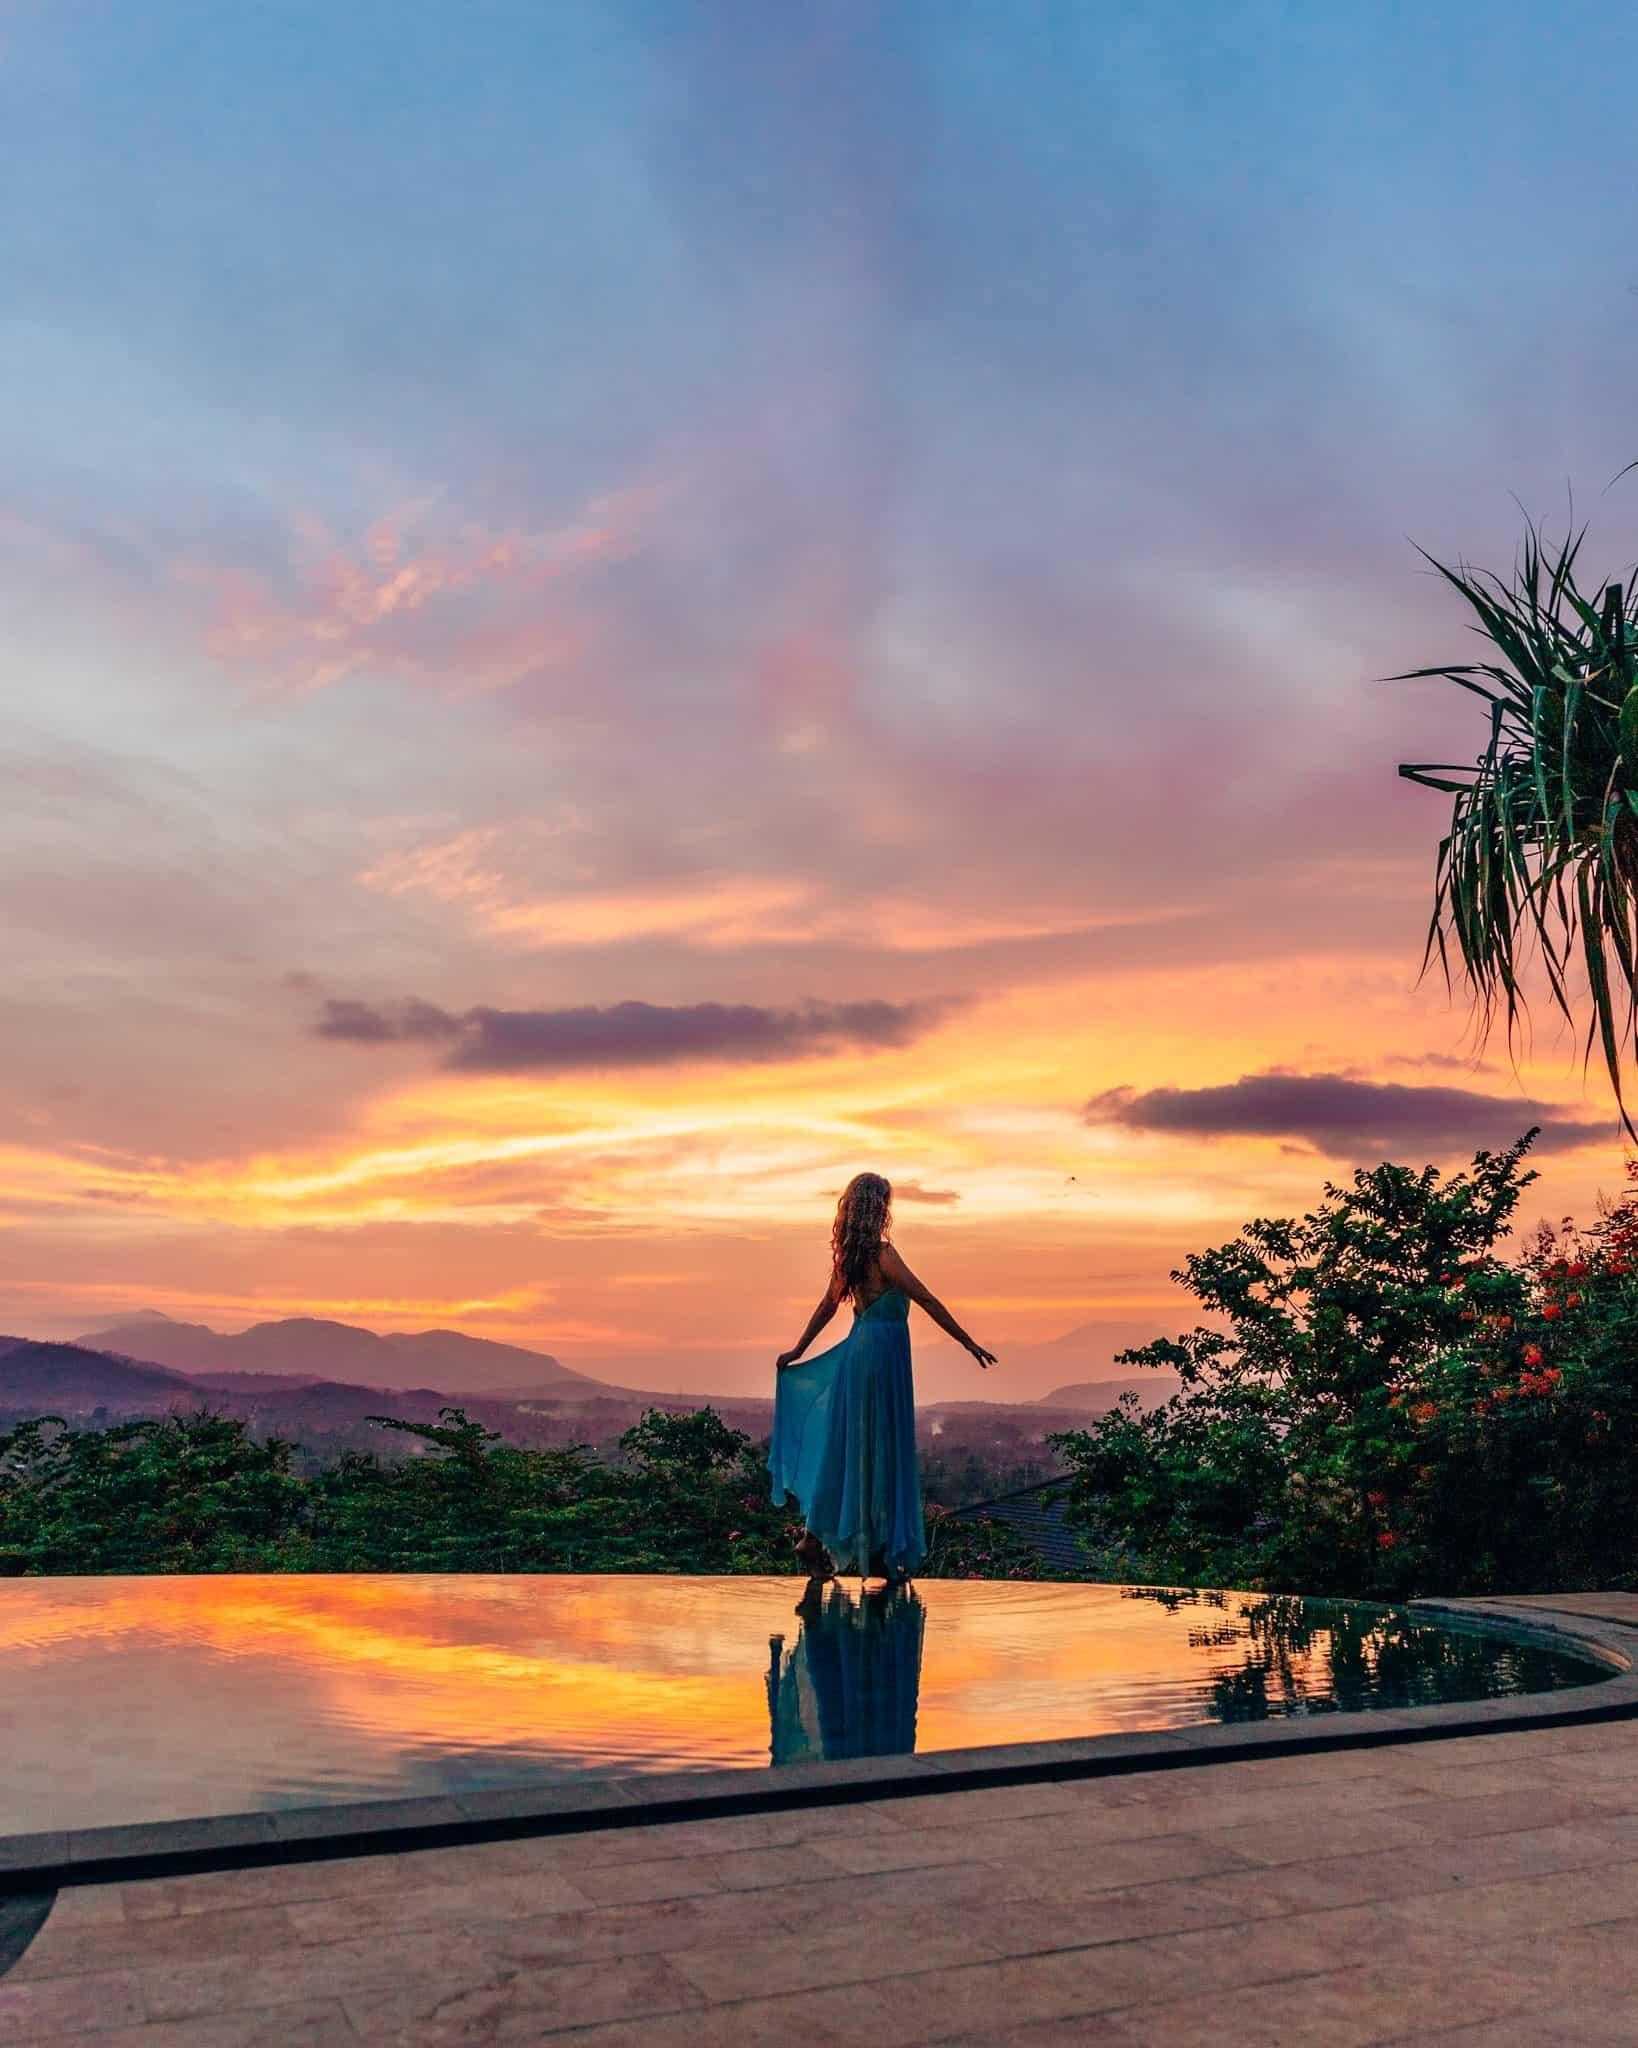 Sunset at Sumberkima Hill, Bali - The Next Trip